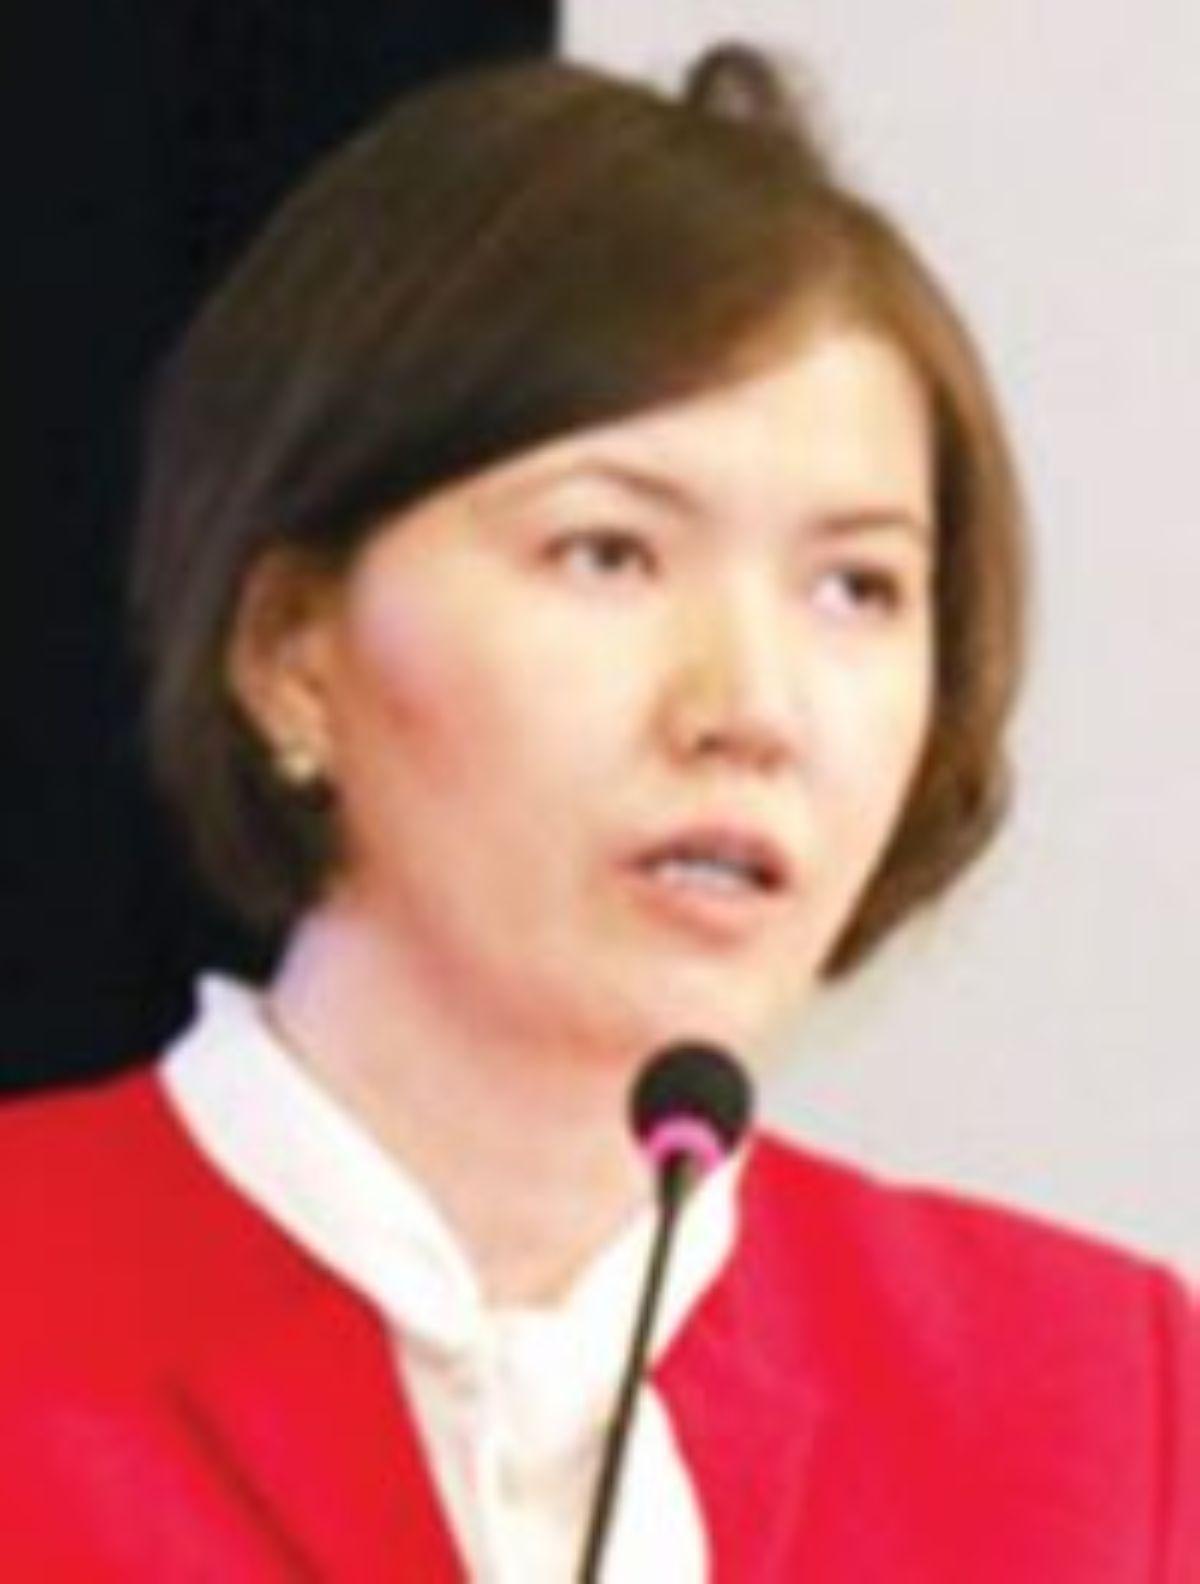 Syleimenova